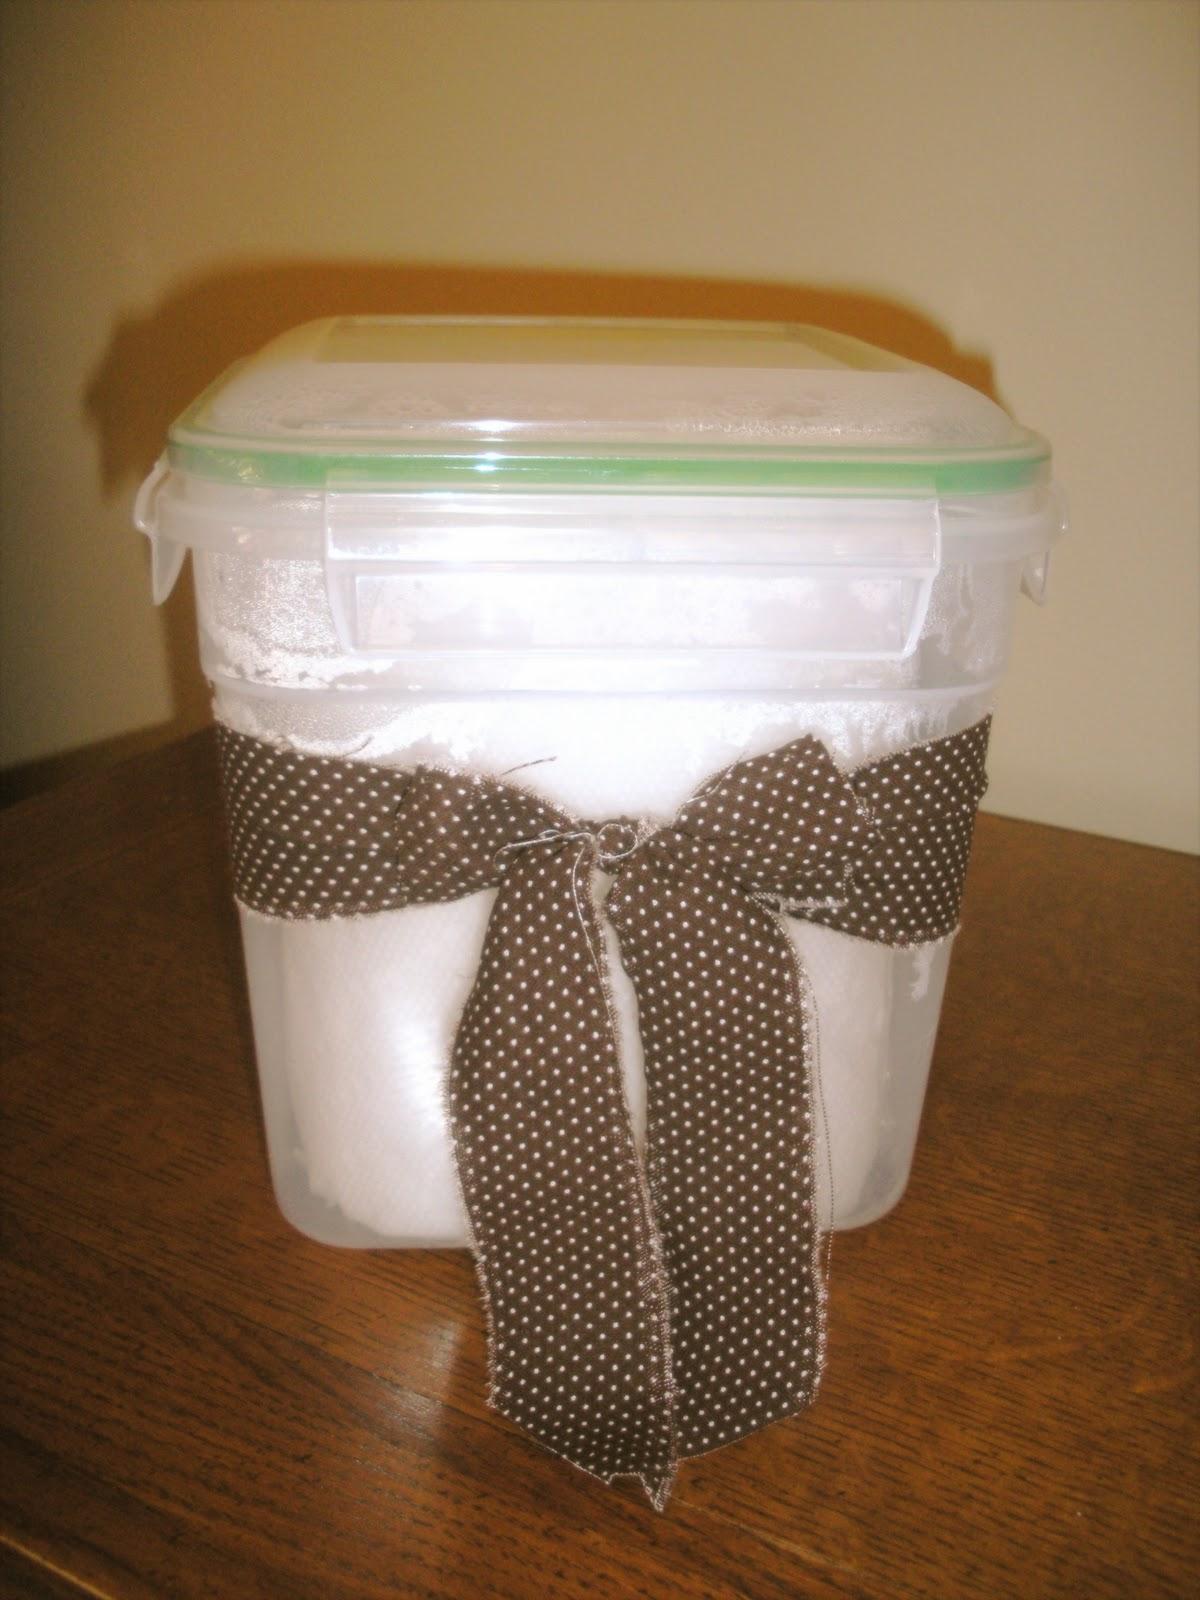 Как заставить цвести эпифиллум уход в домашних условиях 35